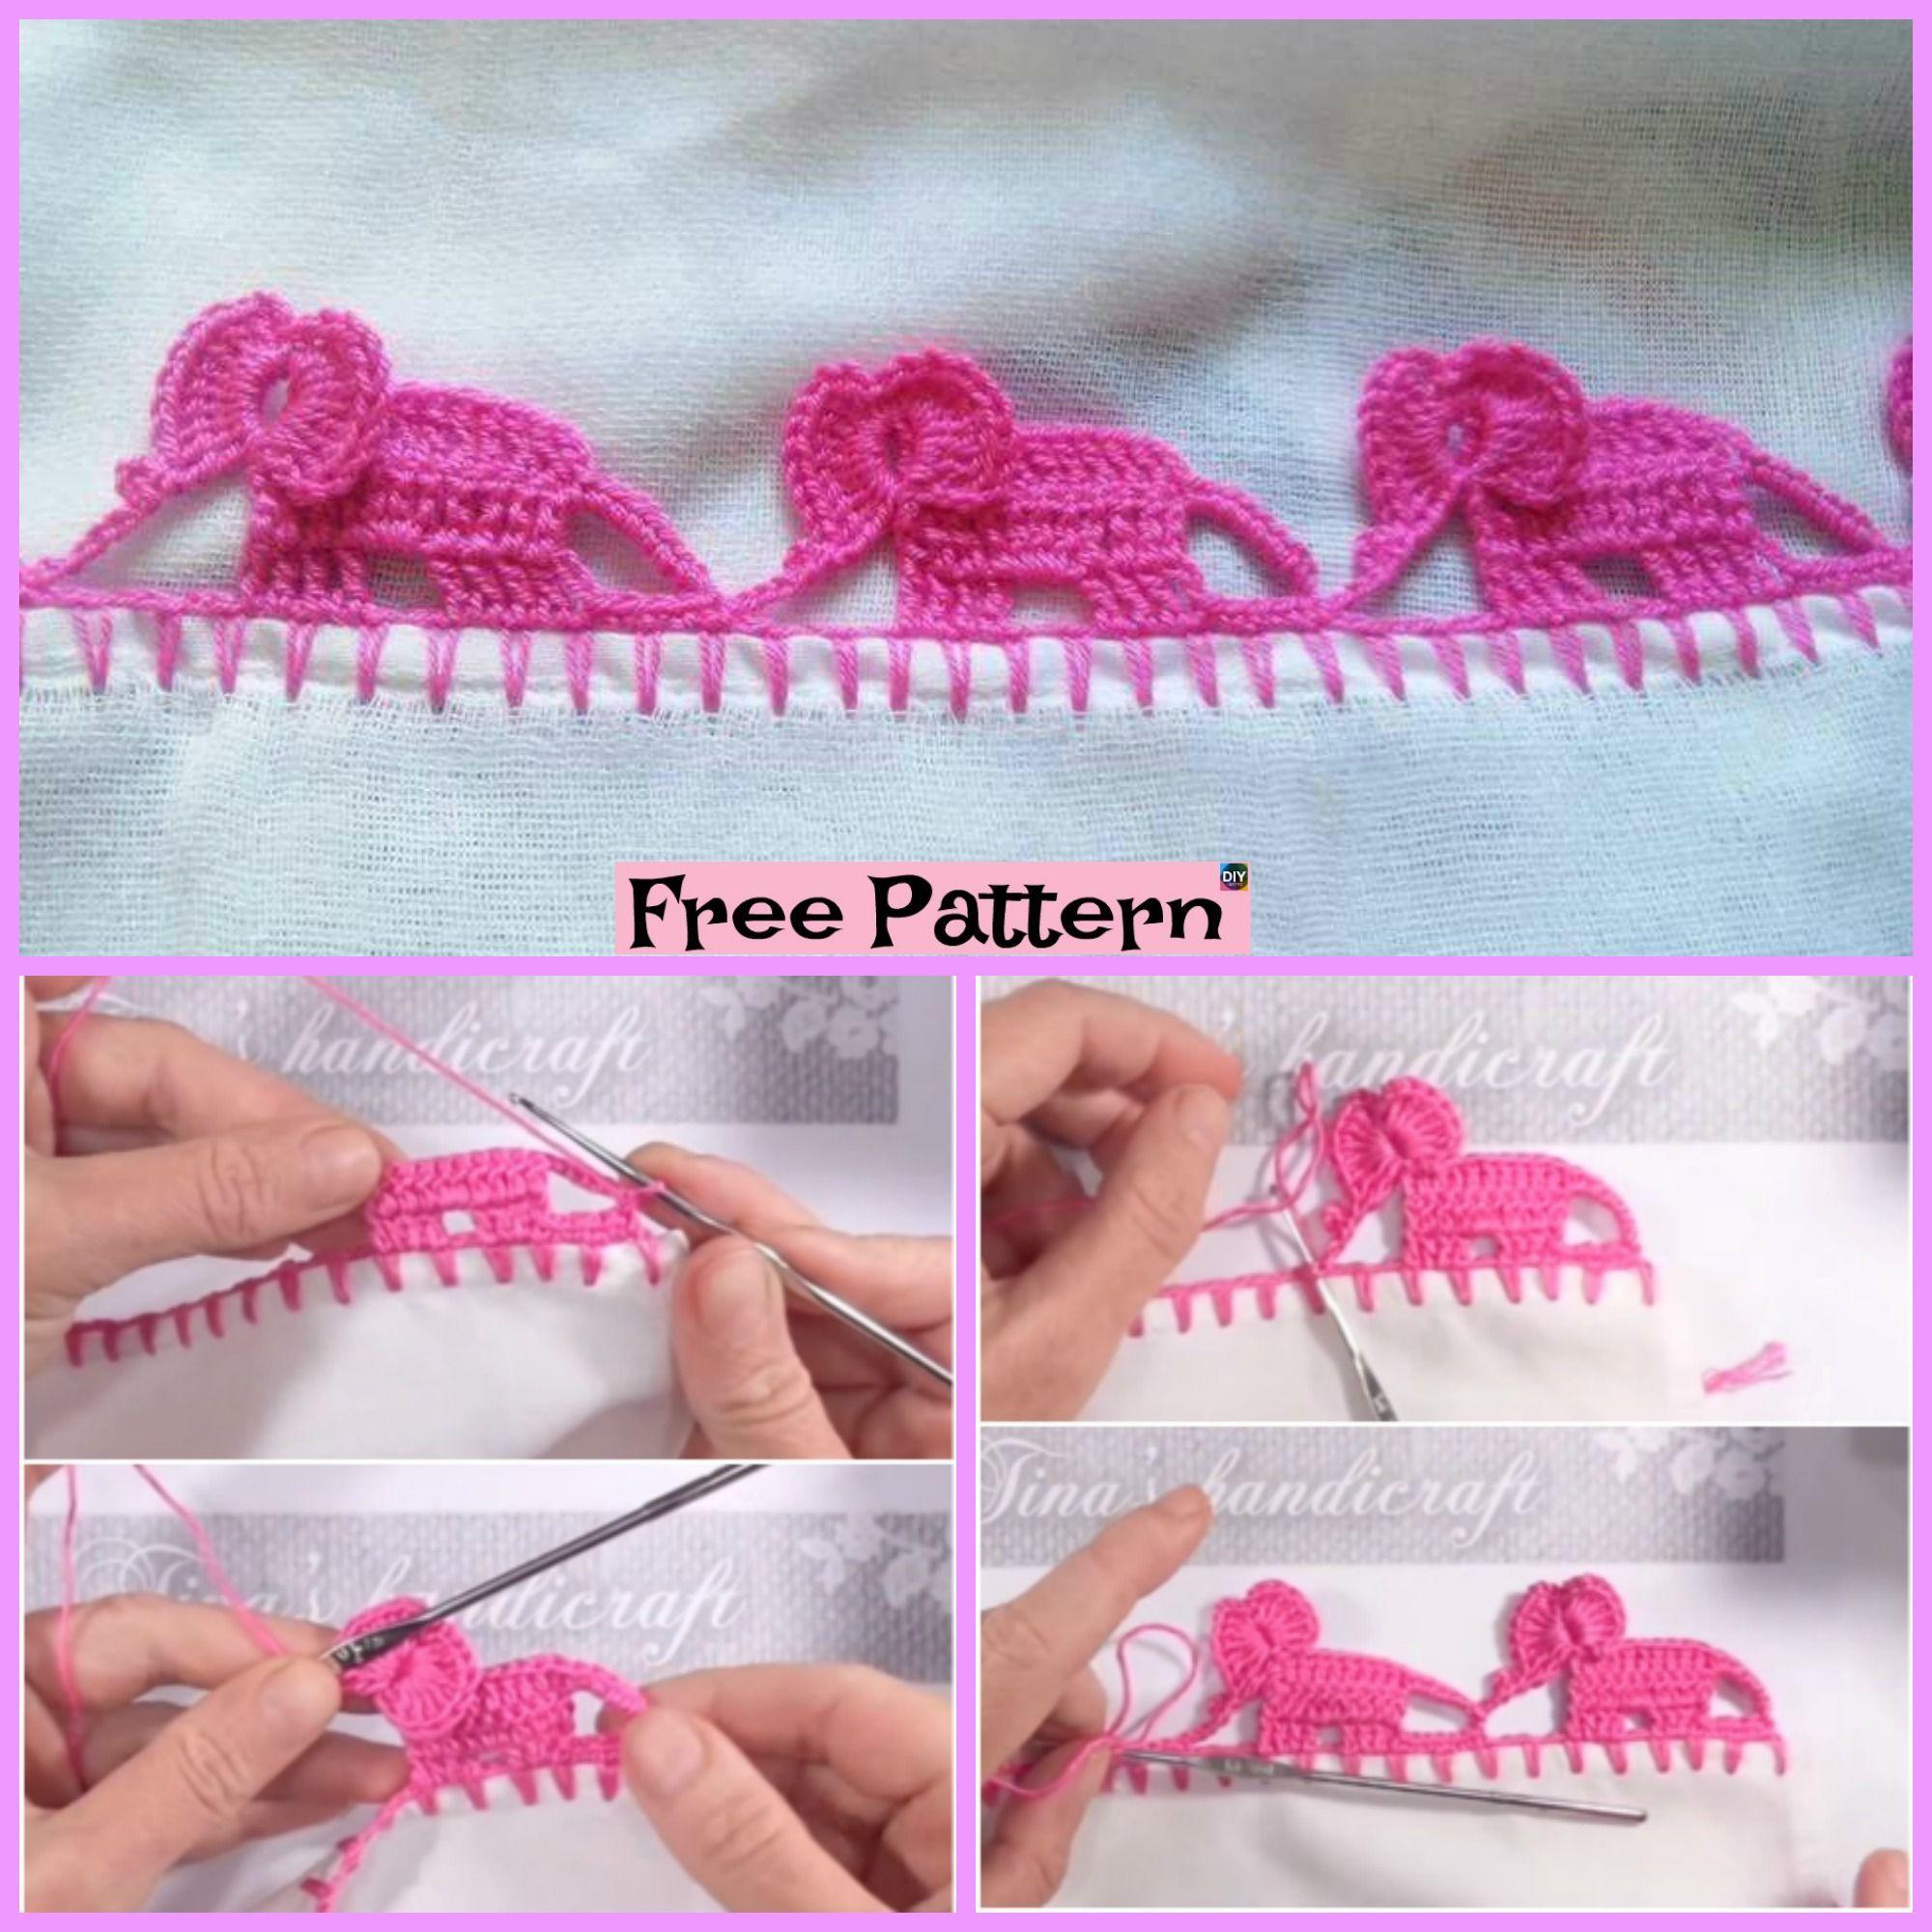 Easy Crochet Elephant Border   Stitch Tutorial! - YouTube   2000x2000